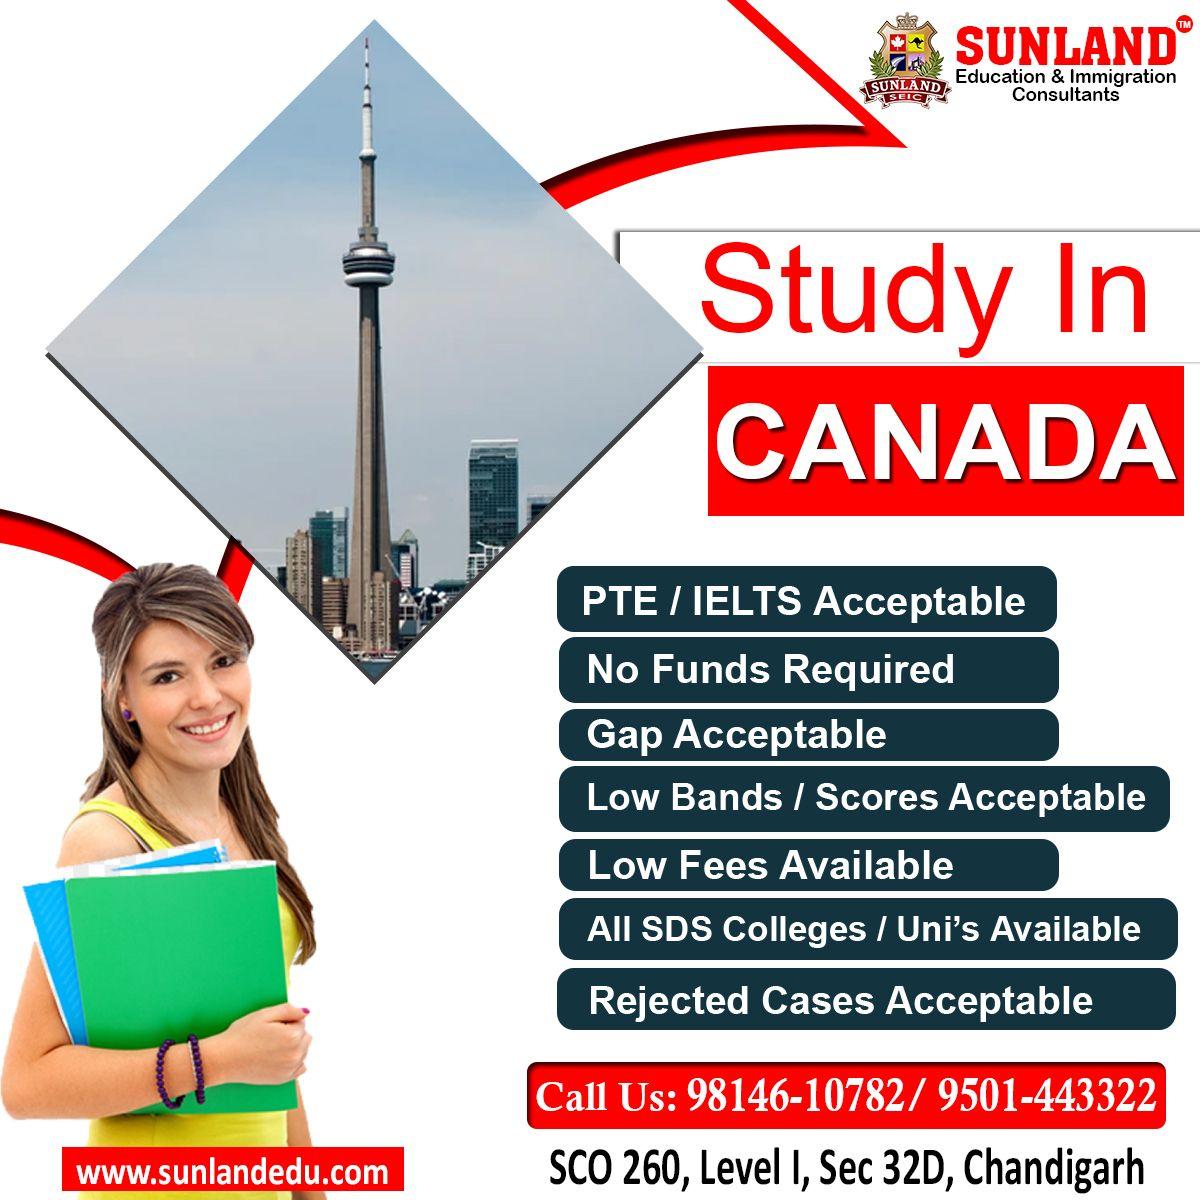 Apply Canada PR/ Canada Study Permit/ Canada Spouse Visa